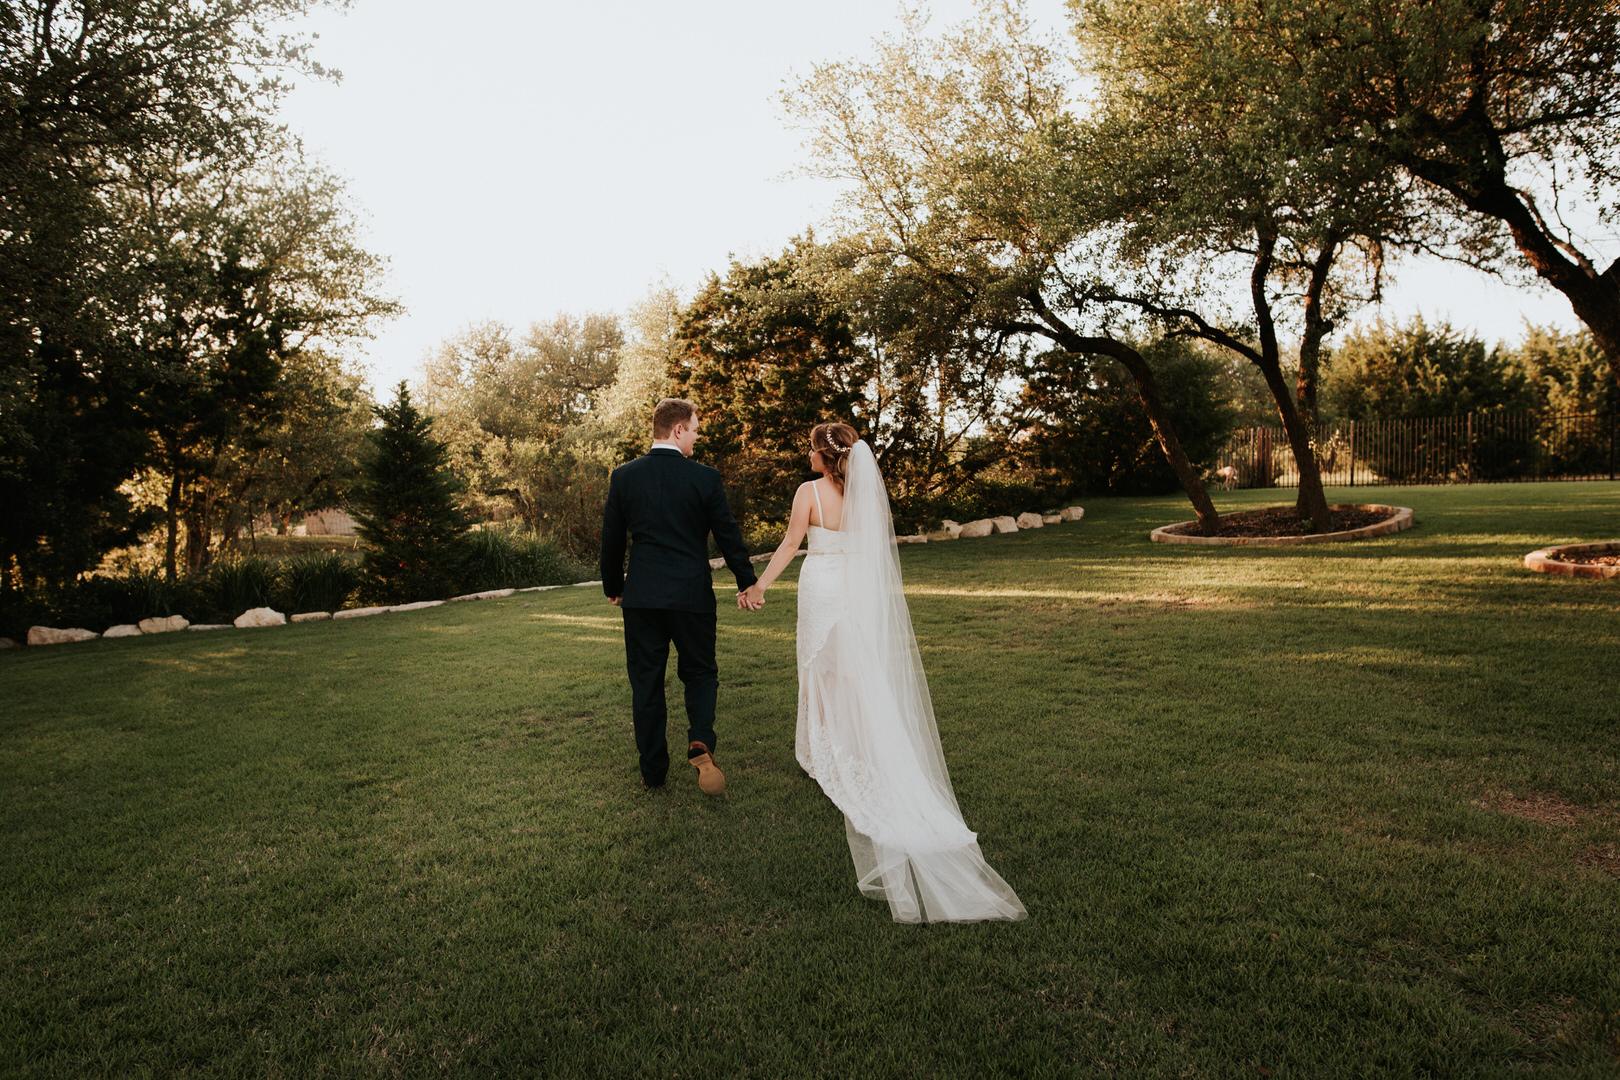 Lexi + Travis Wedding - Diana Ascarrunz Photography-503.jpg